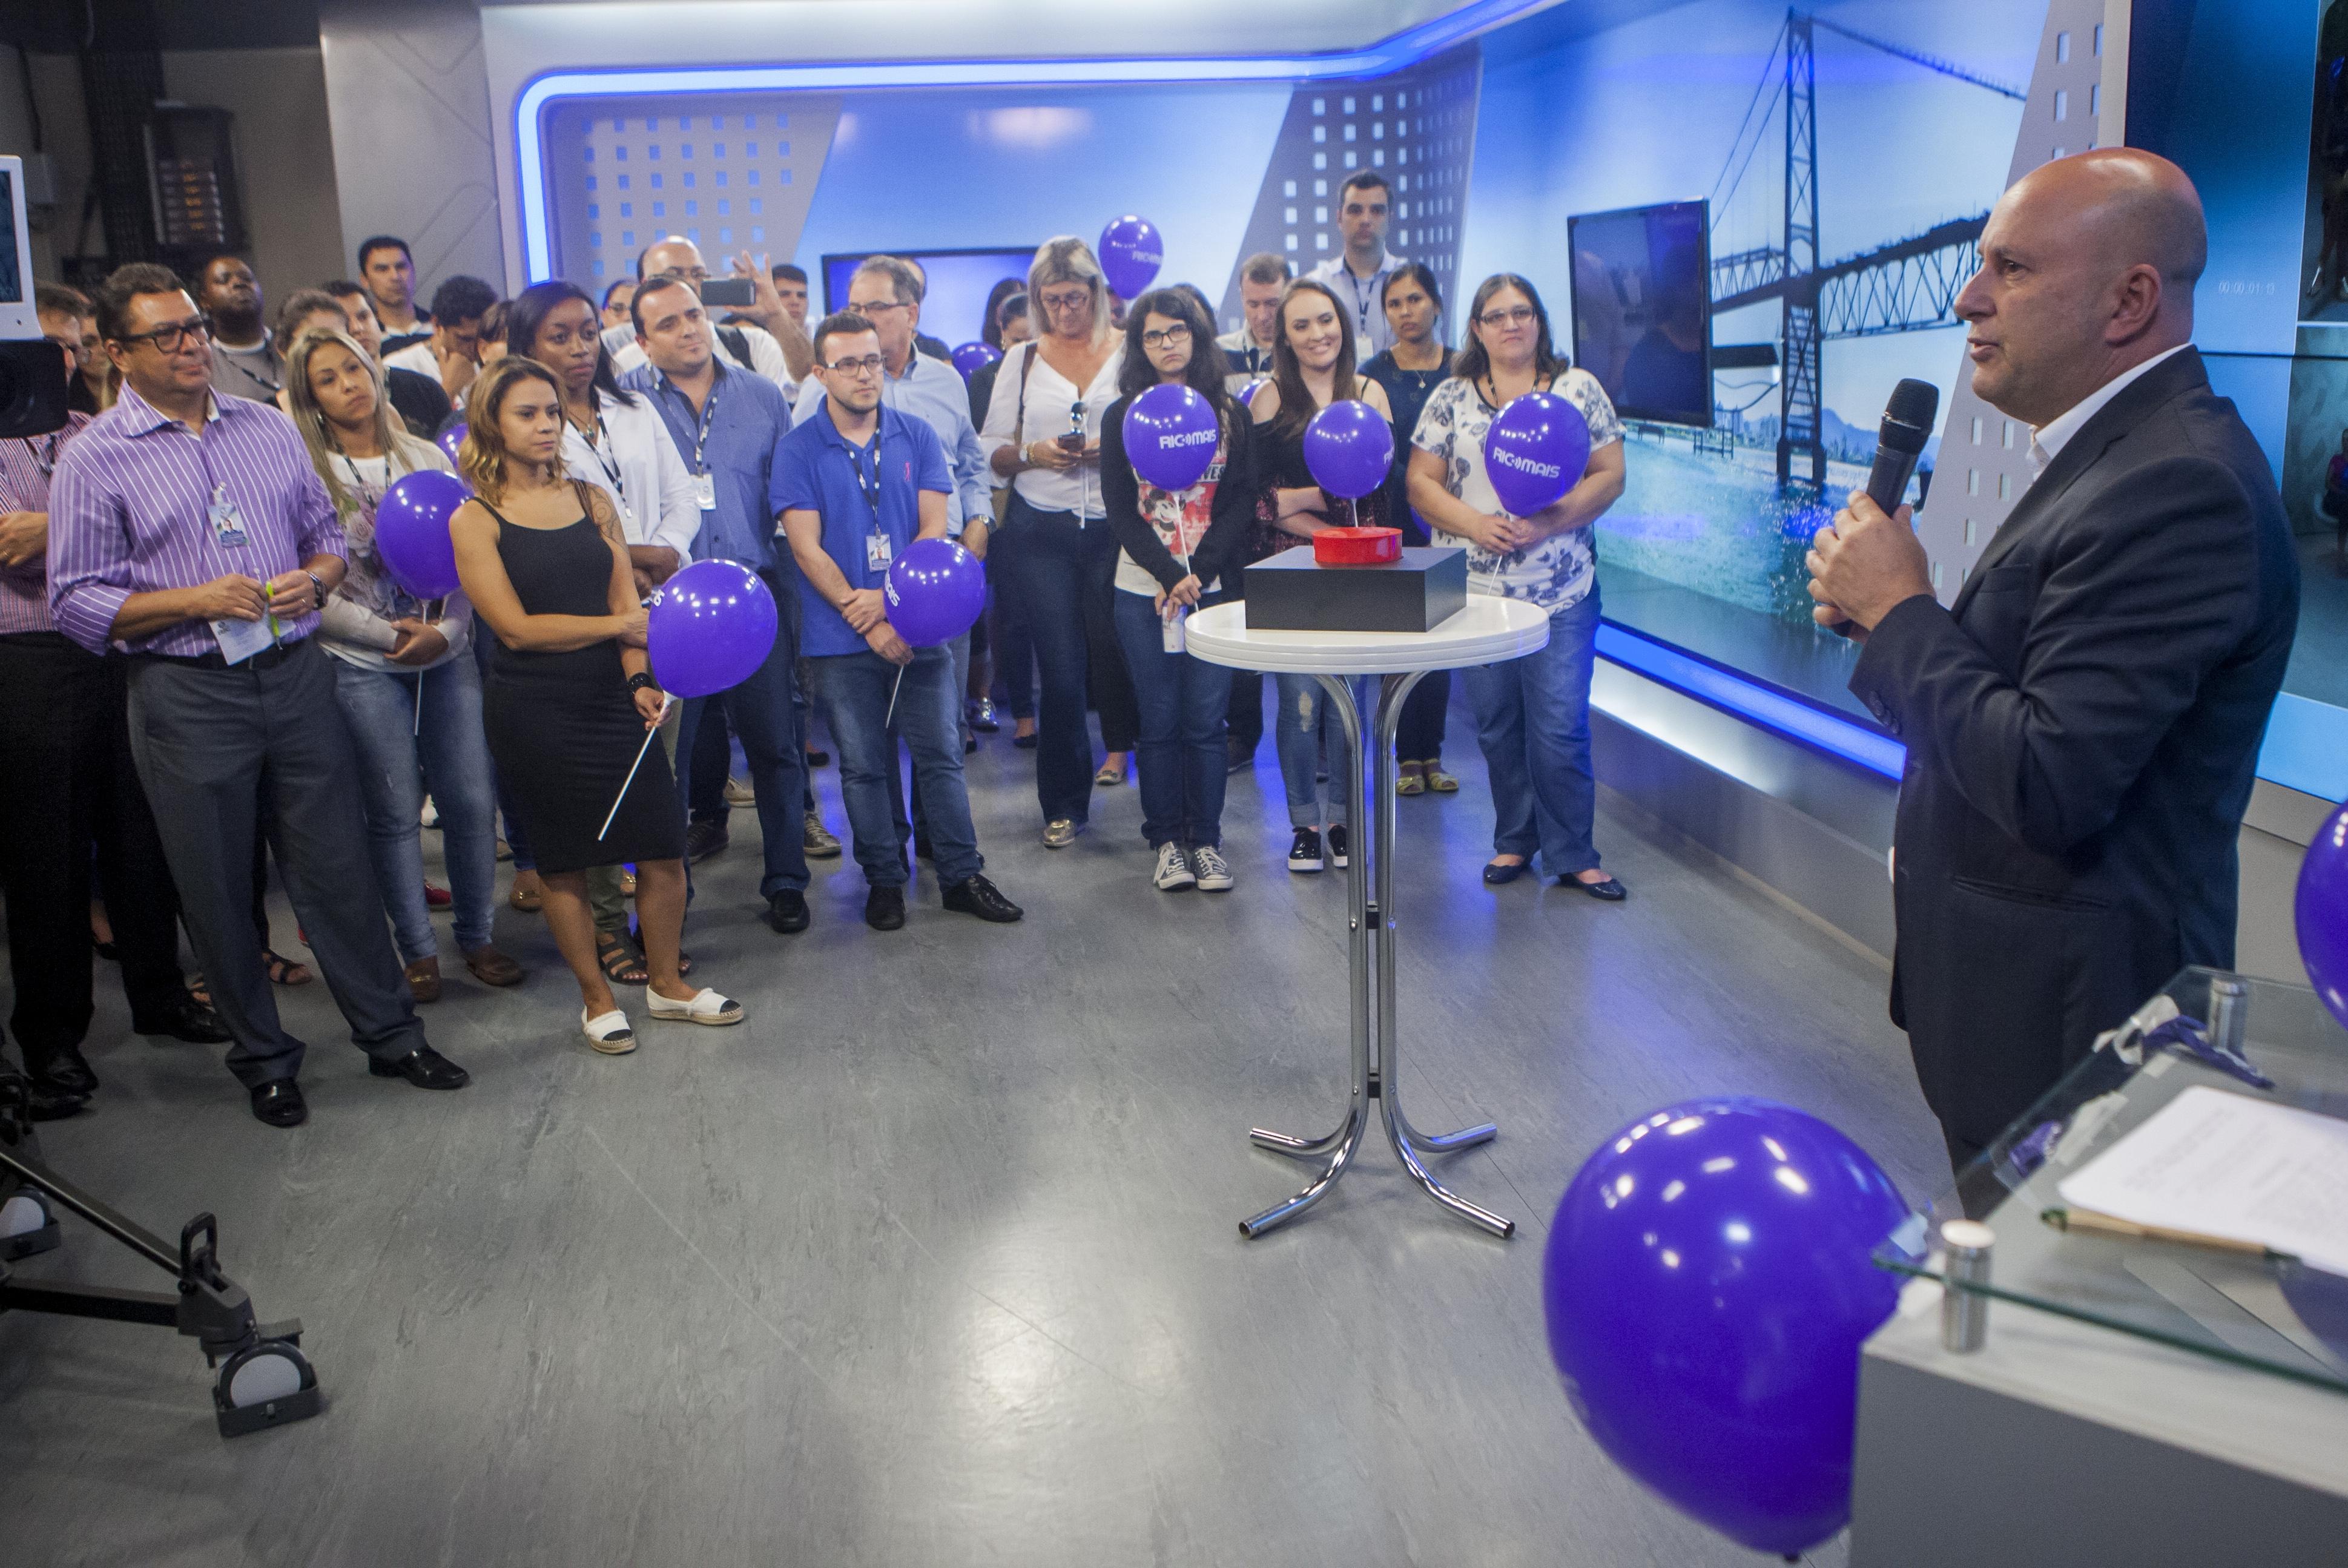 Presidente executivo do Grupo RIC SC, Marcello Corrêa Petrelli, participou do lançamento do portal - Flávio Tin/ND